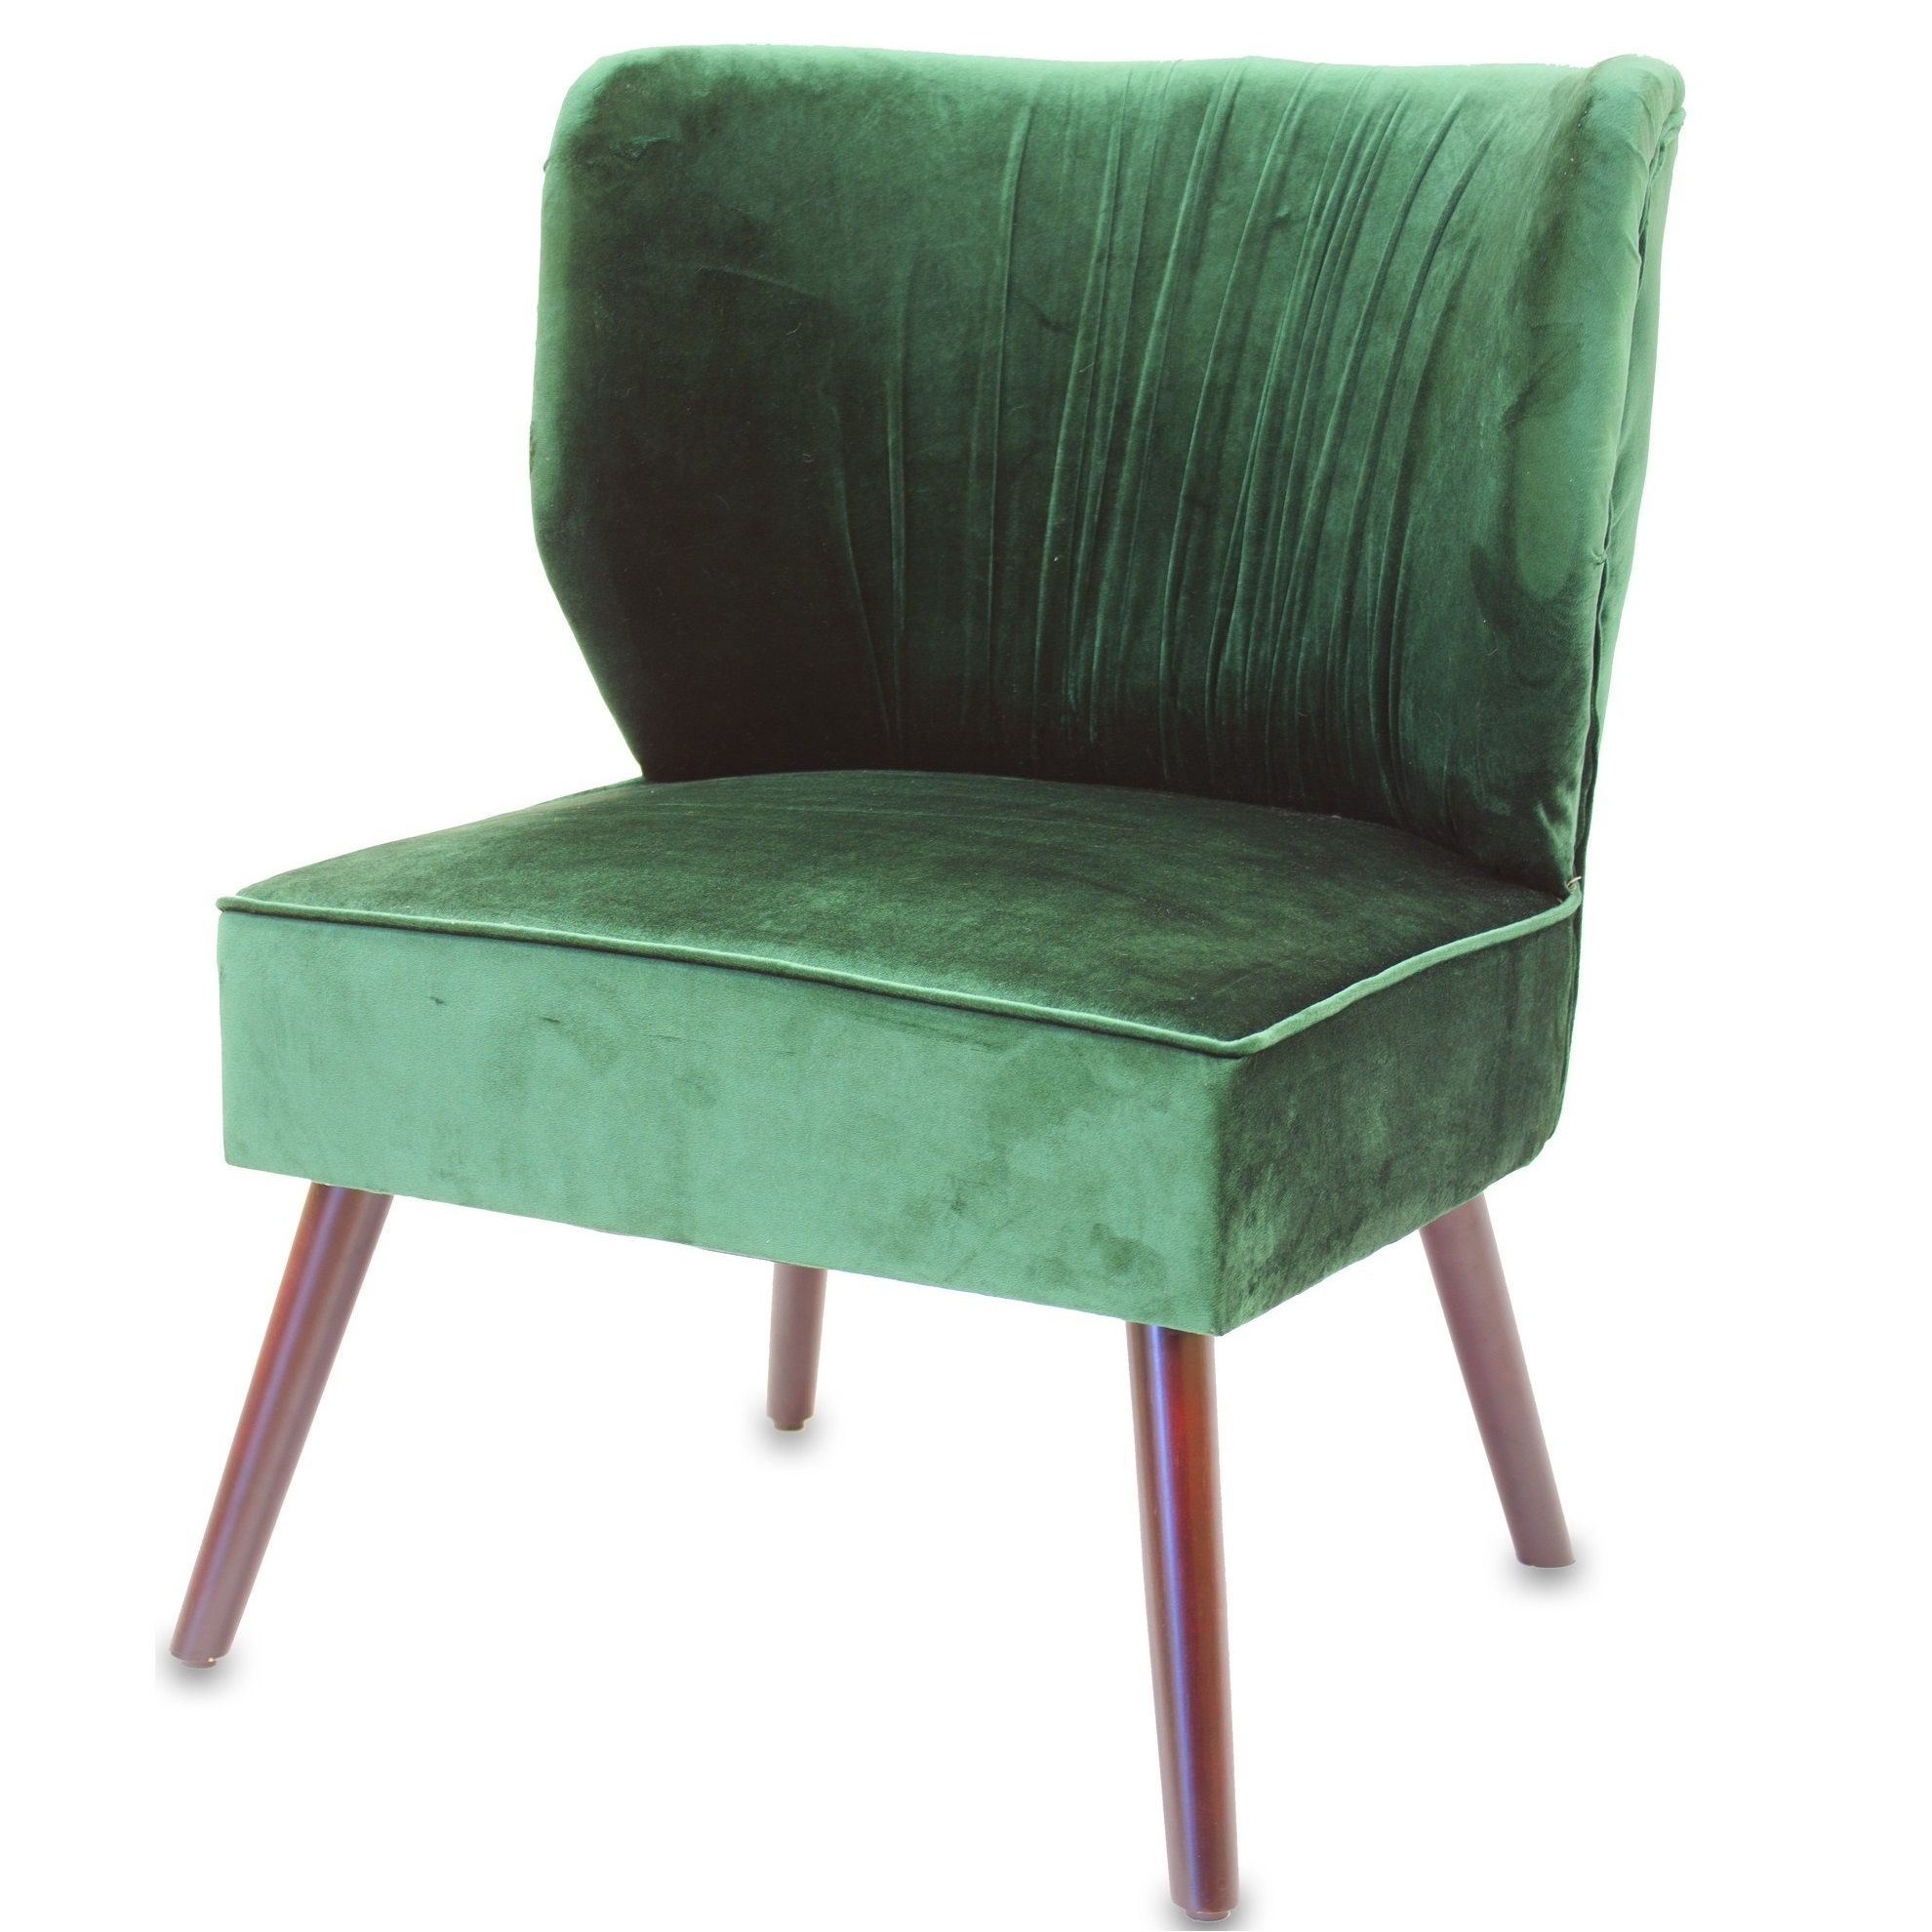 Fotel Kolor Mietowy With Images Fotel Krzeslo Projektowanie